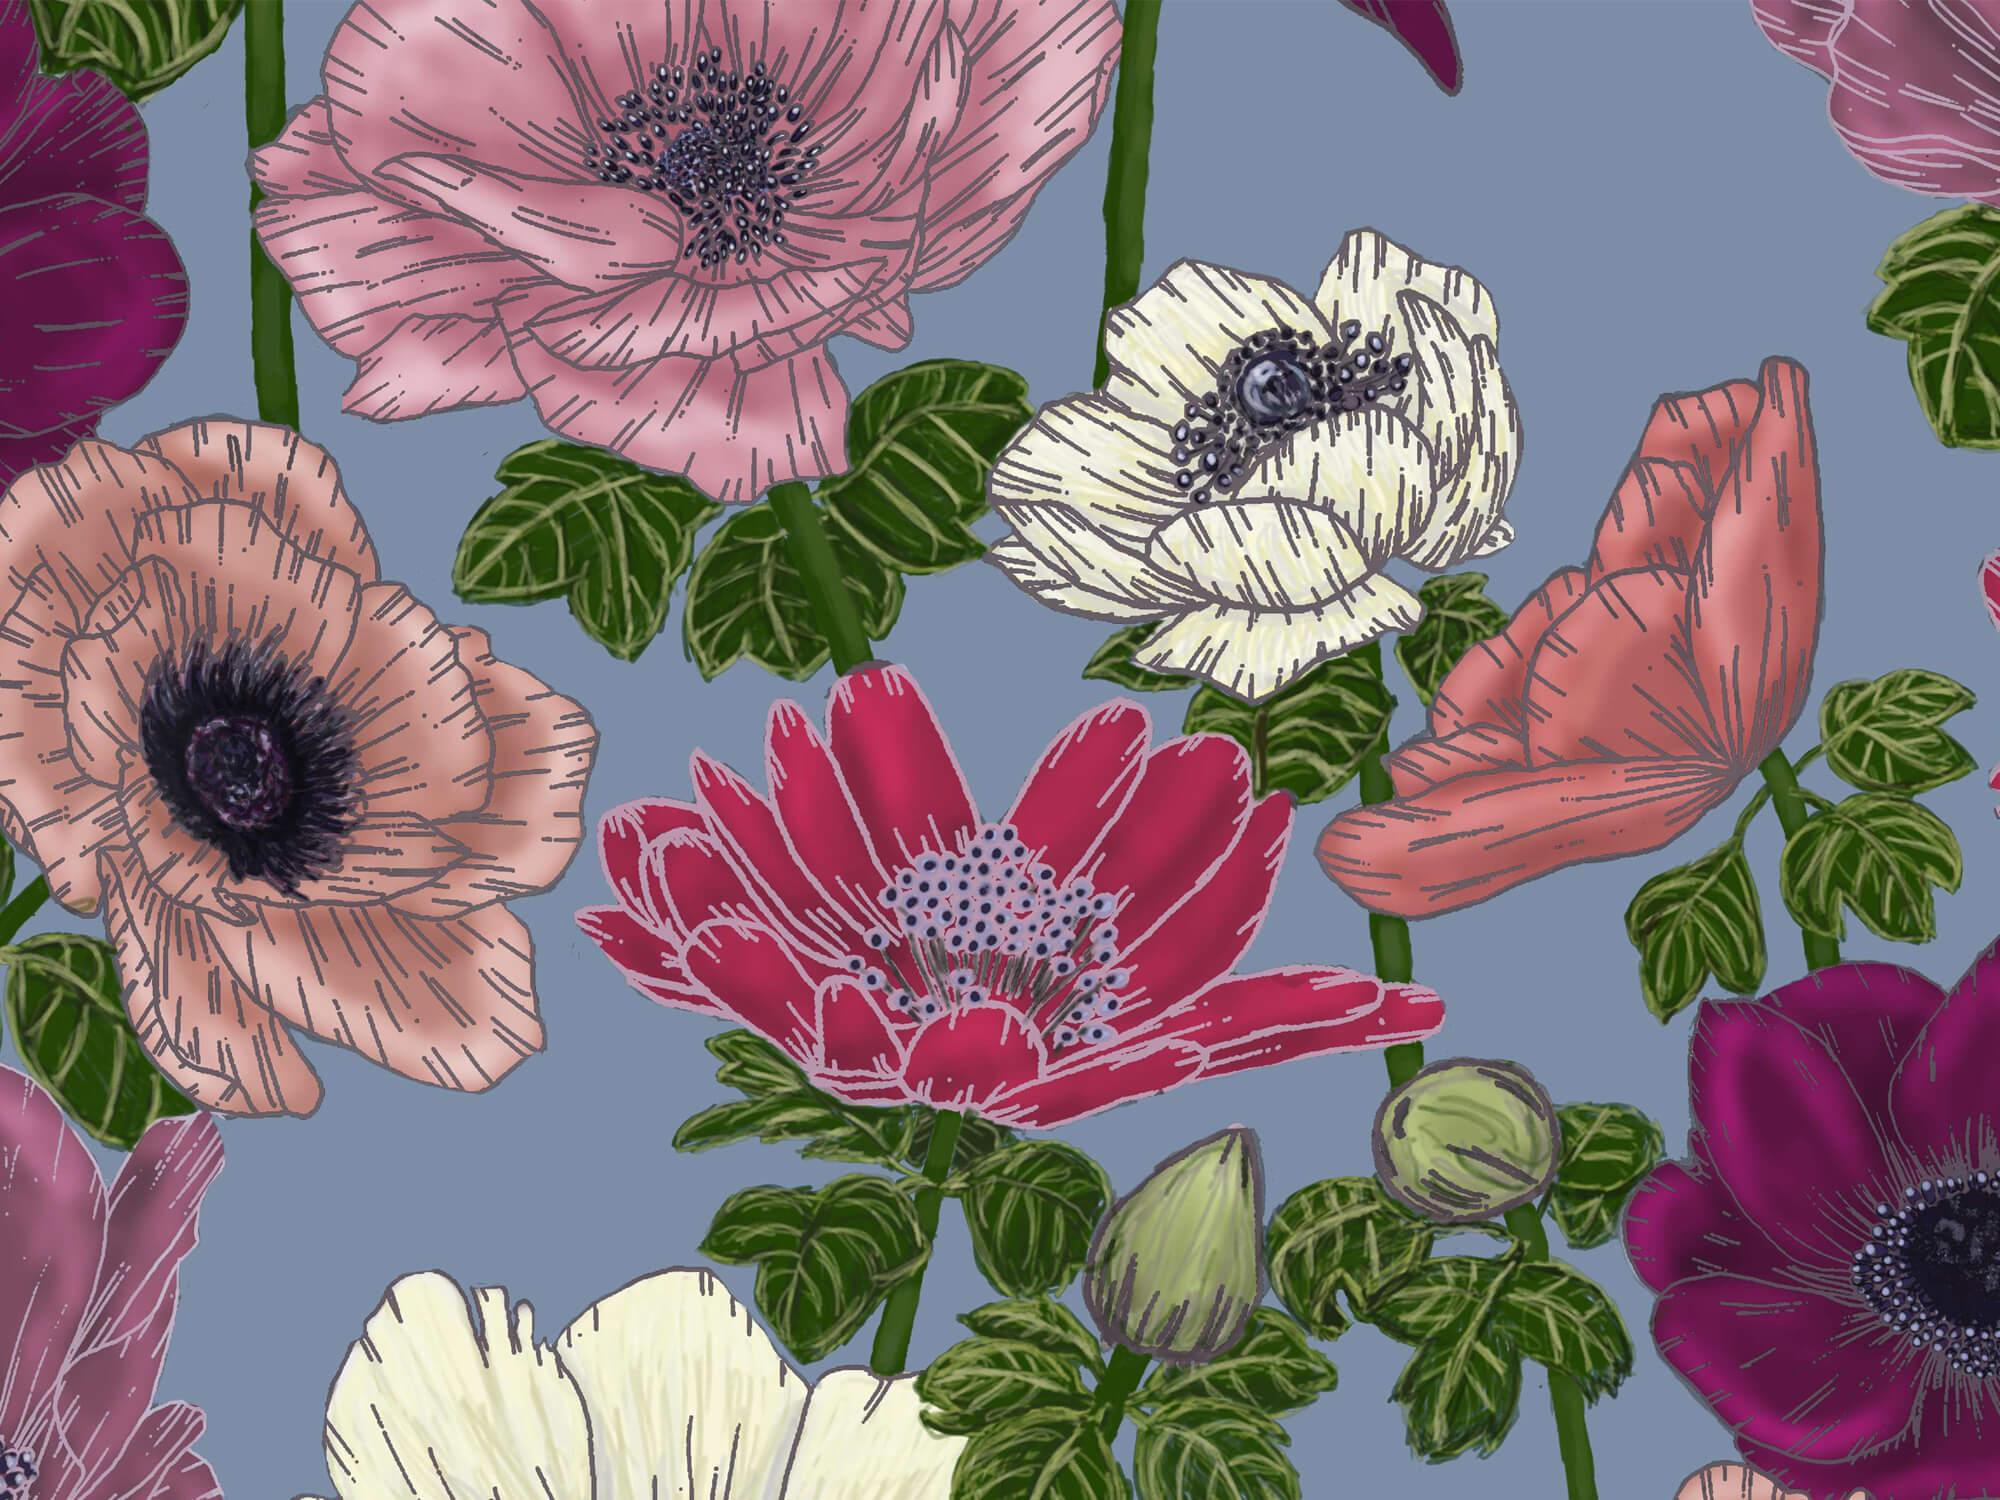 Student work of digital textile design